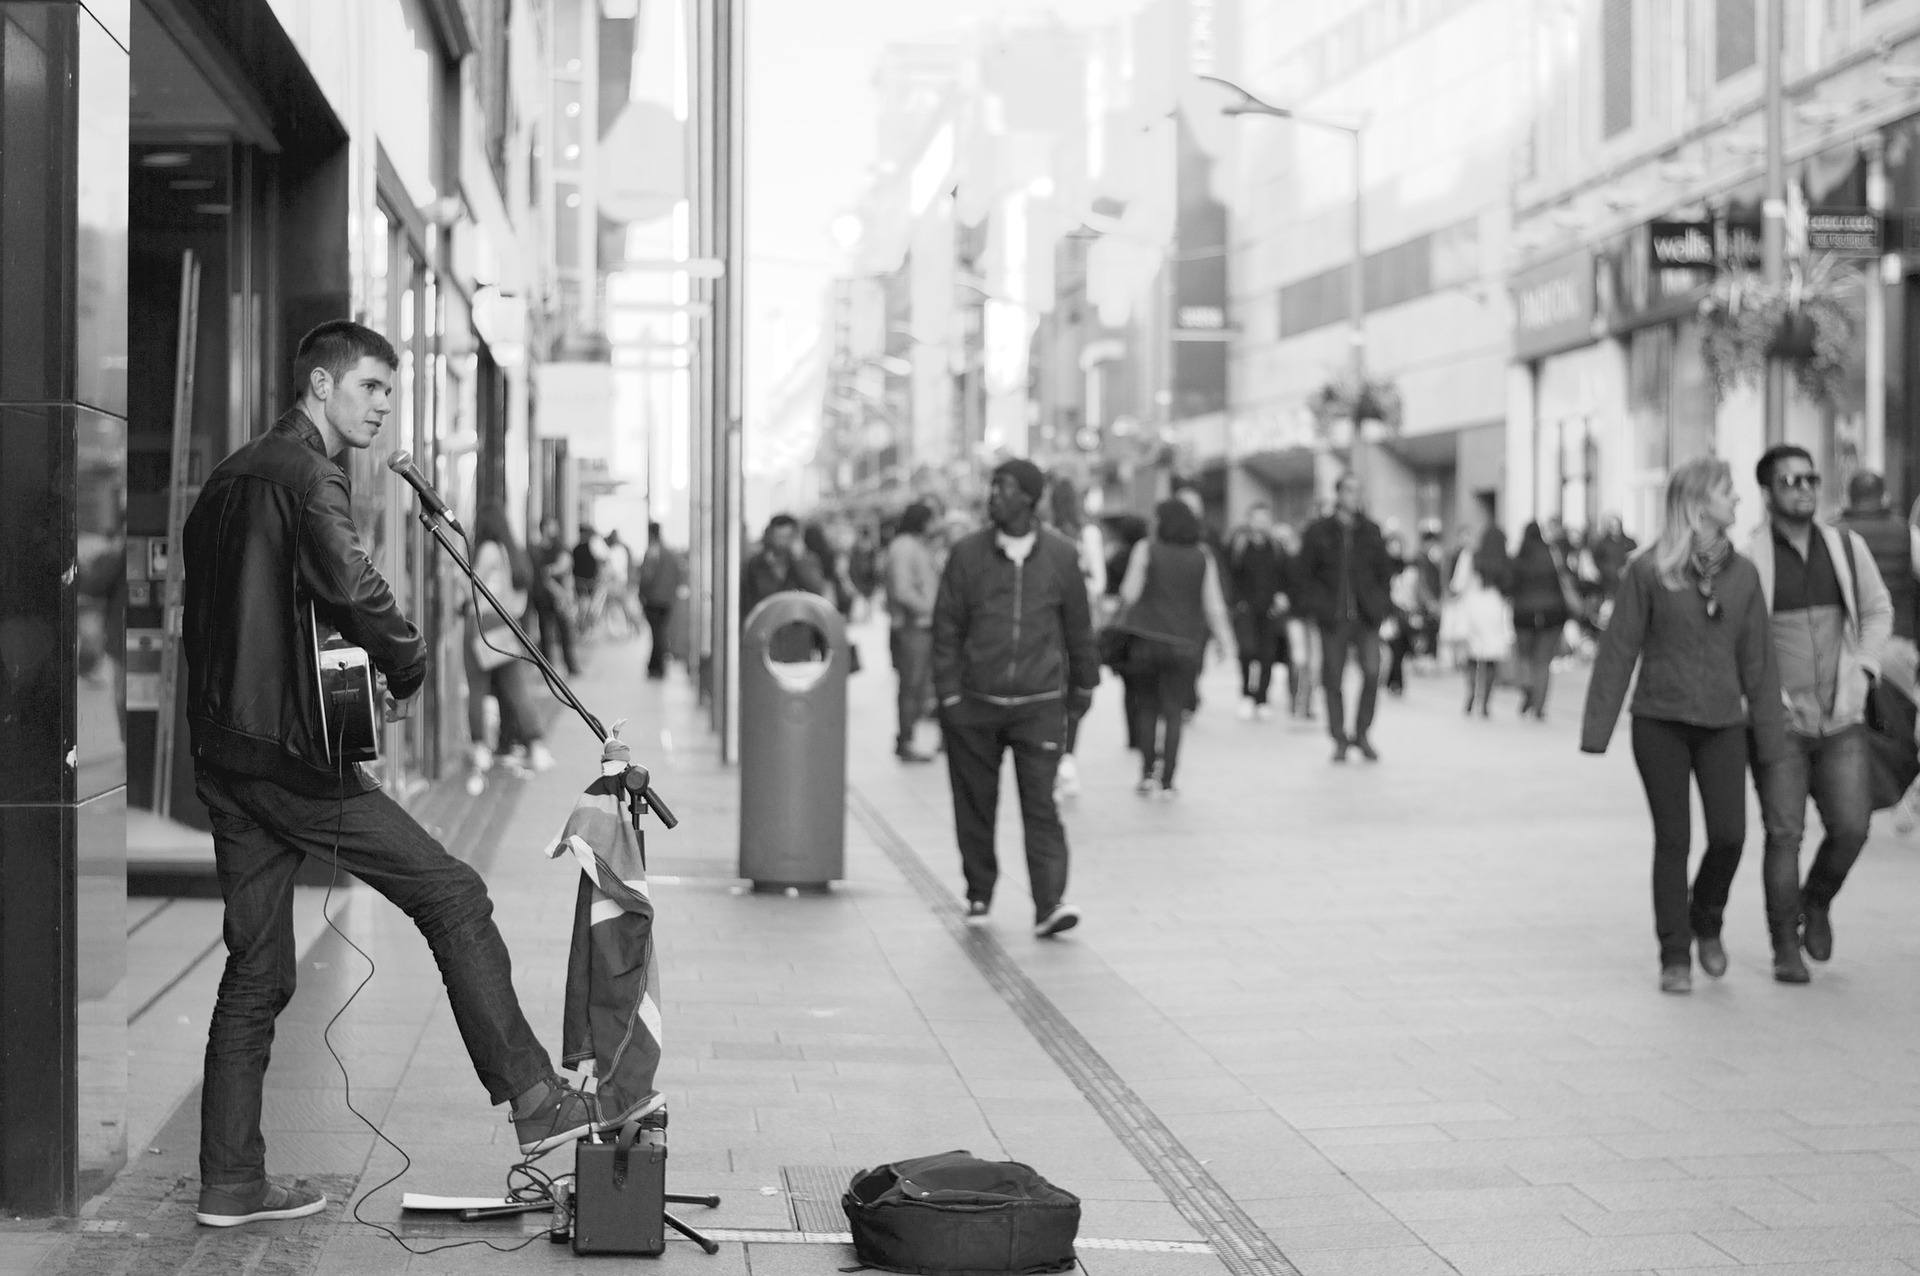 Black and white shot of man busking for money